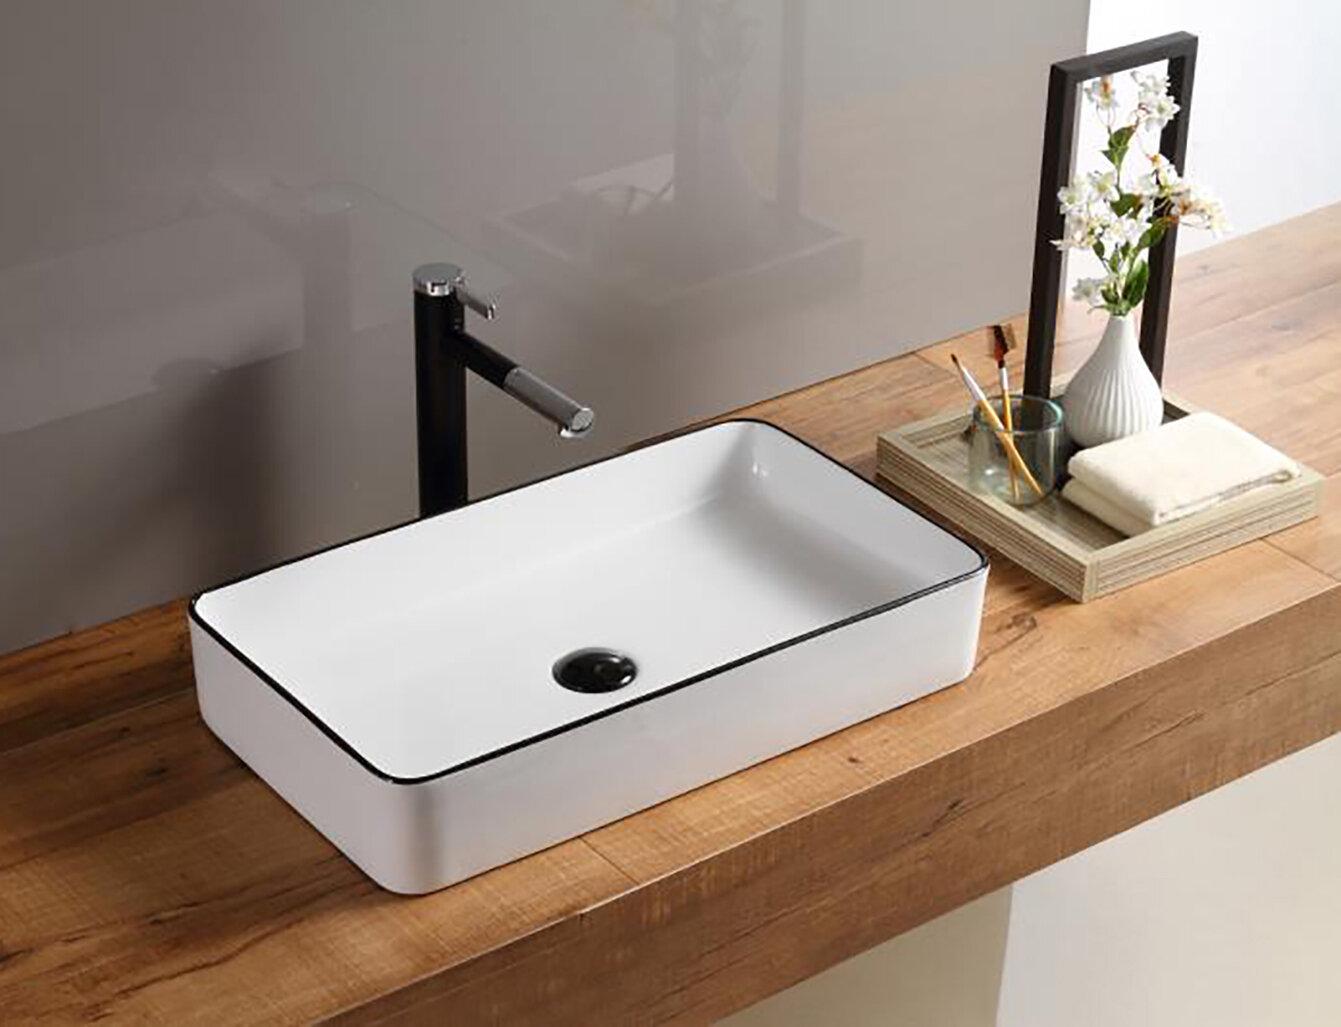 Hometure Ceramic Rectangular Vessel Bathroom Sink Reviews